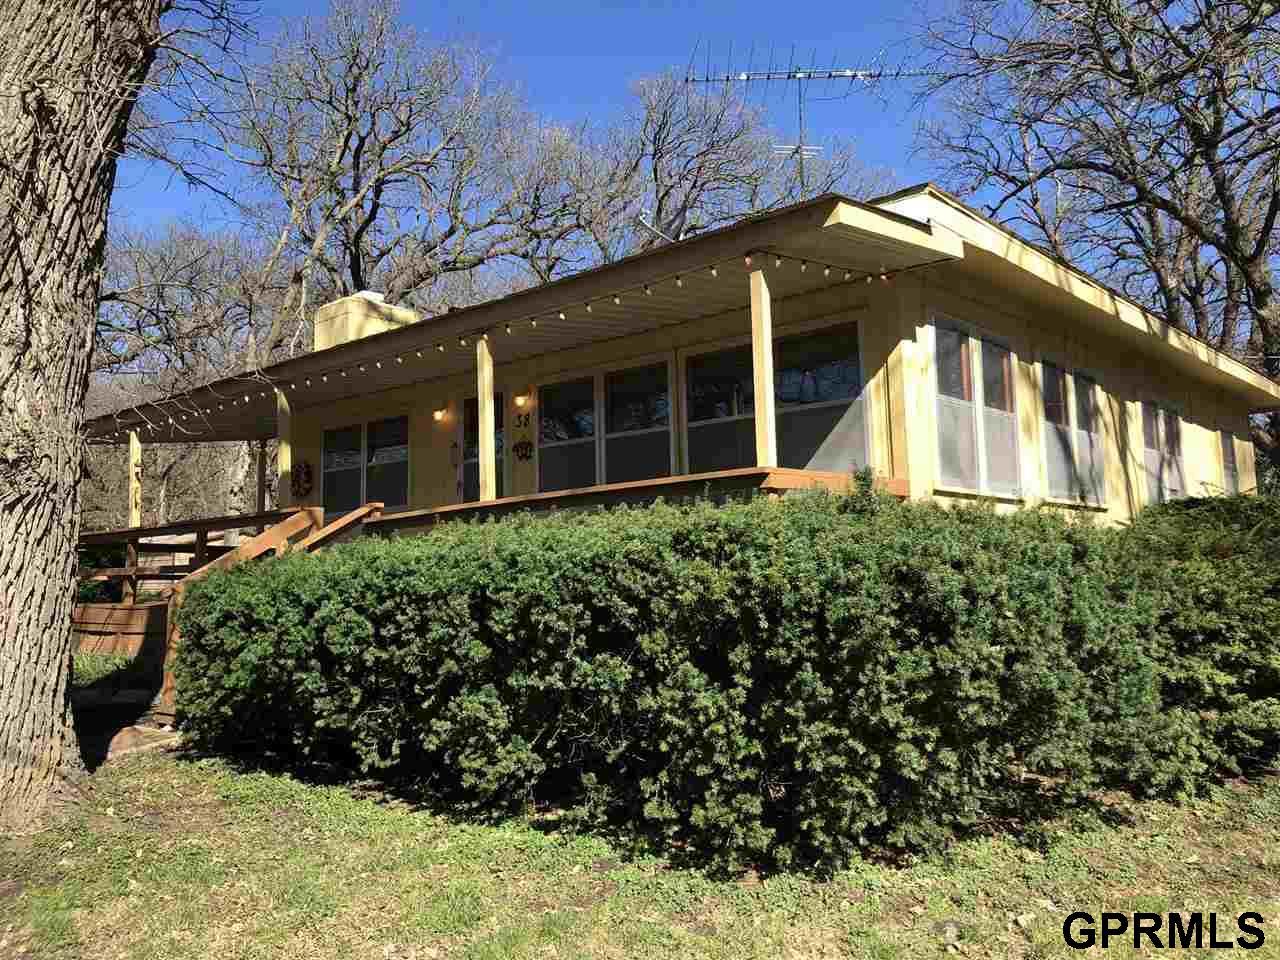 2165 Blue River Lodge Circle 38 Crete Ne 68333 Berkshire Hathaway Home Services Ambassador Real Estate